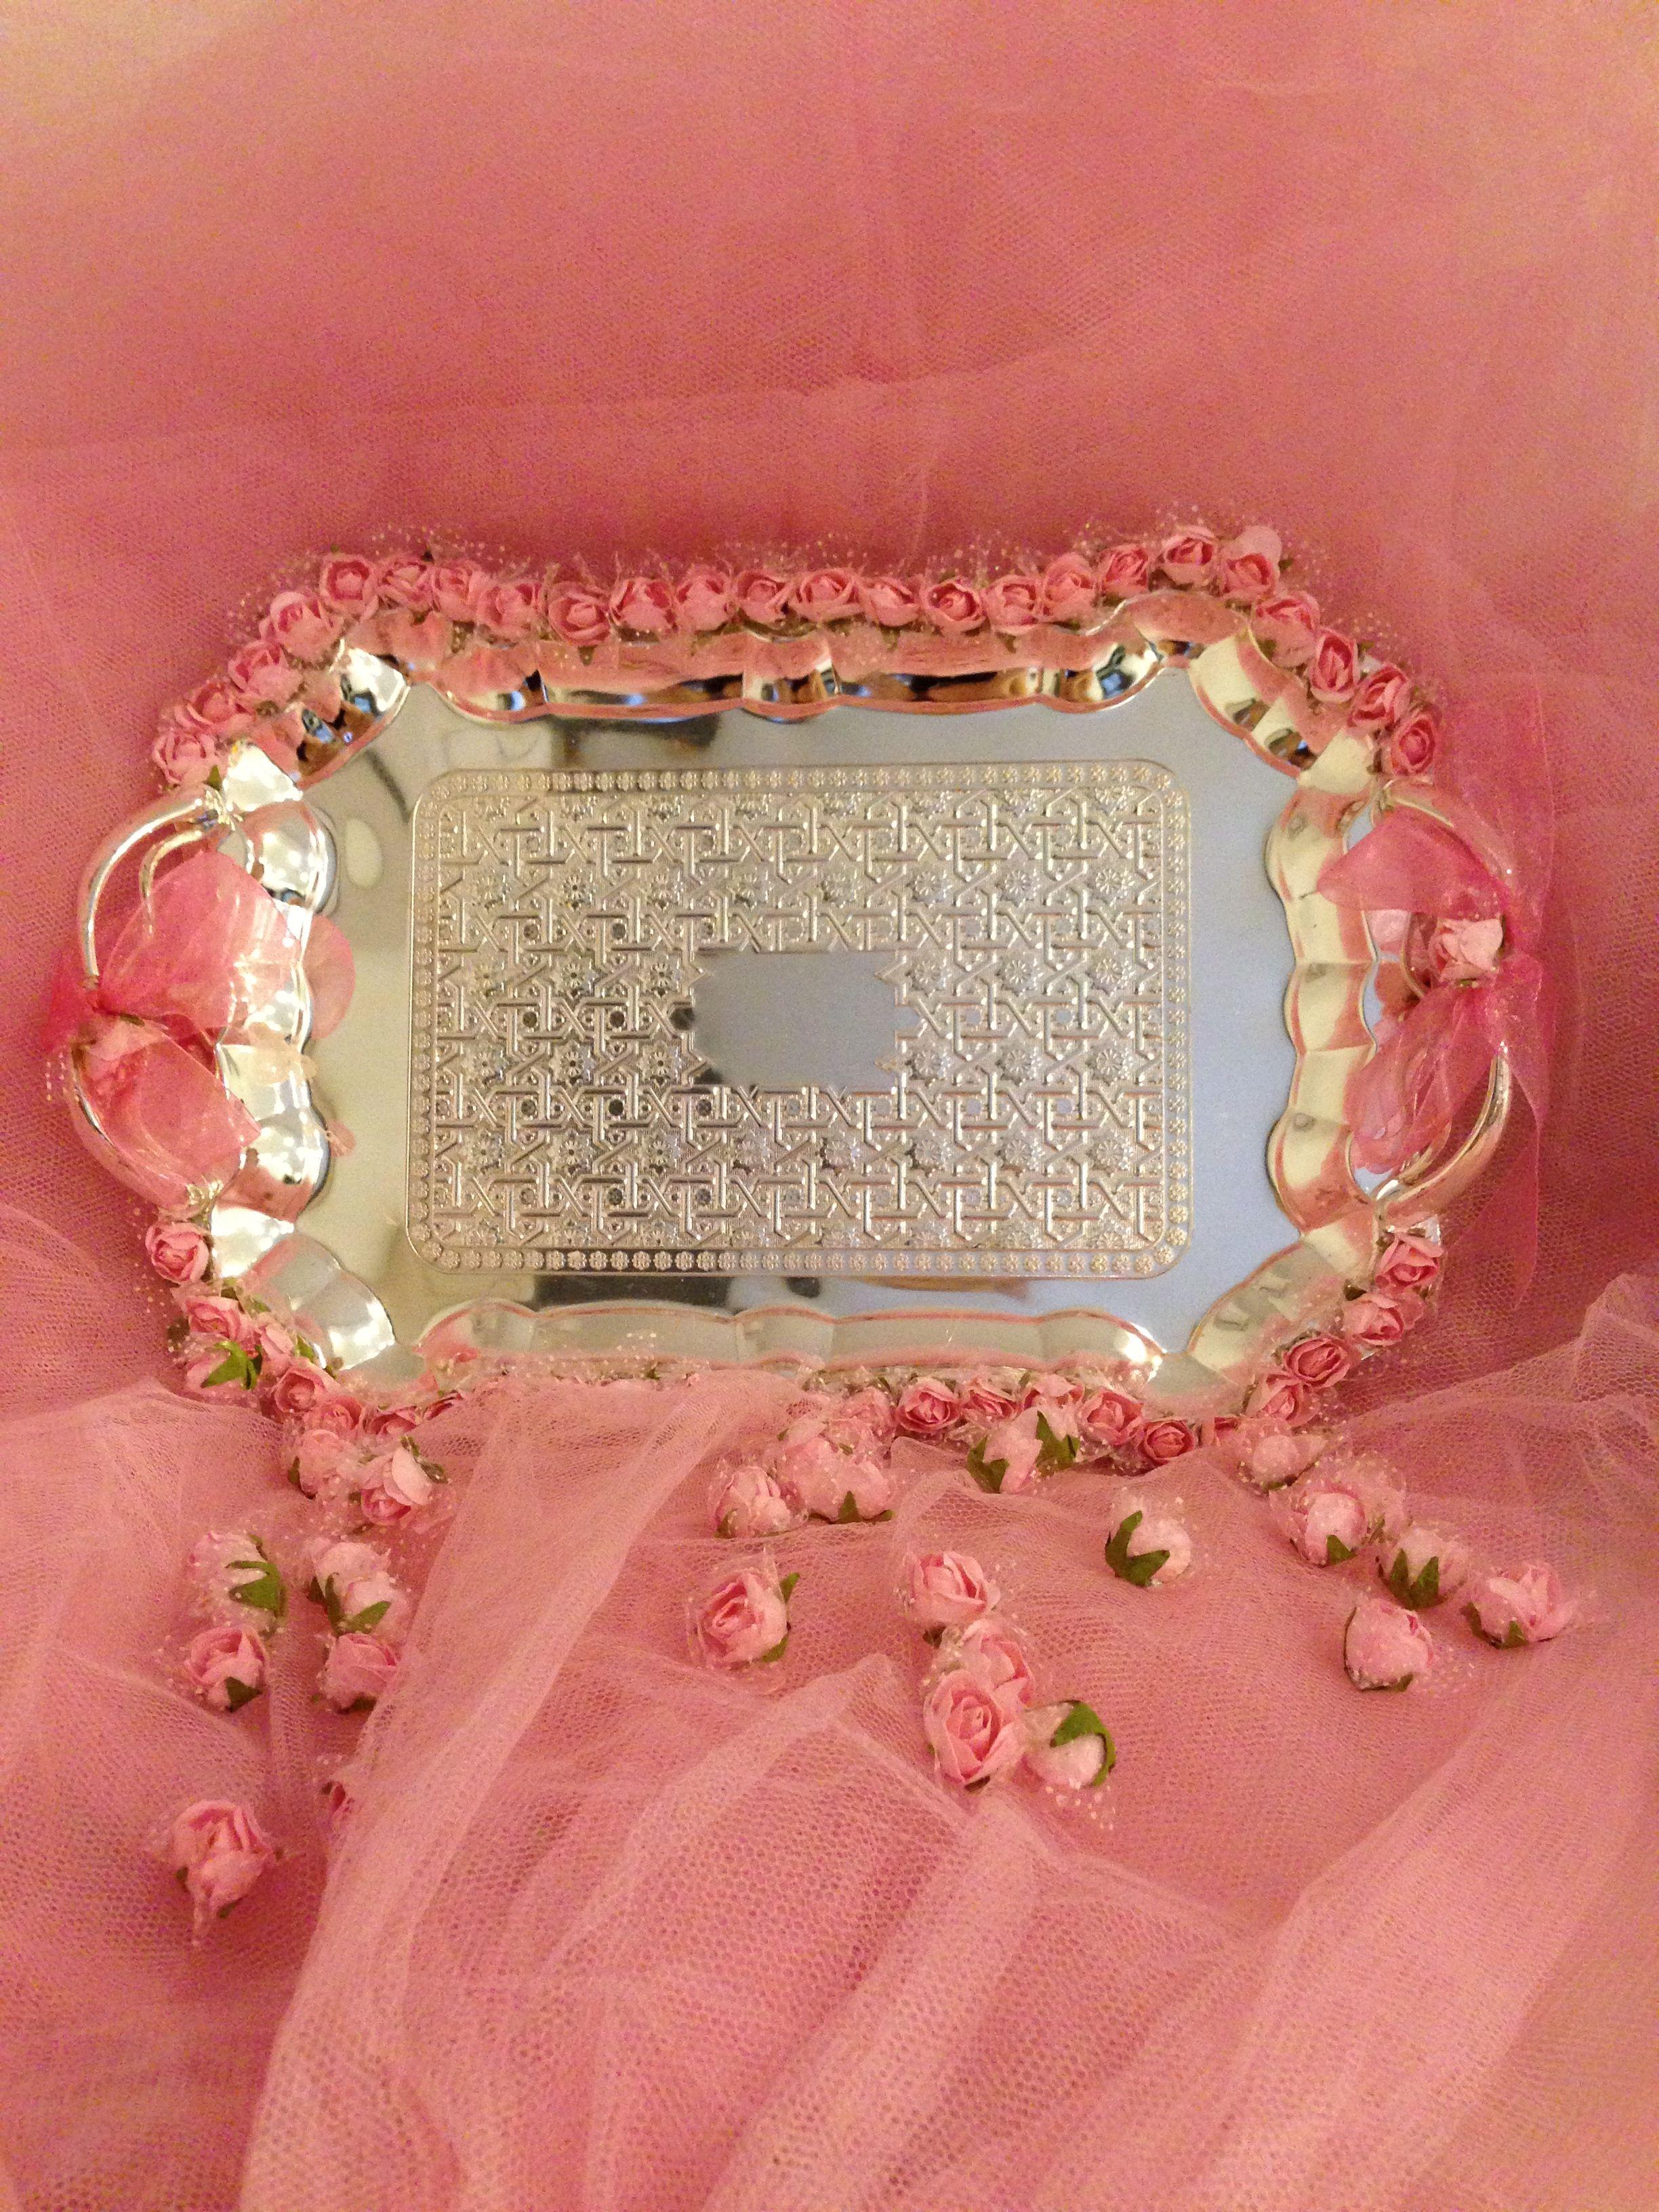 Lohusa Erbet Tepsisi Bebeimiz In Fikirler Pinterest Serbet Minnie Mouse Wedding Decorations Mini Jewelry